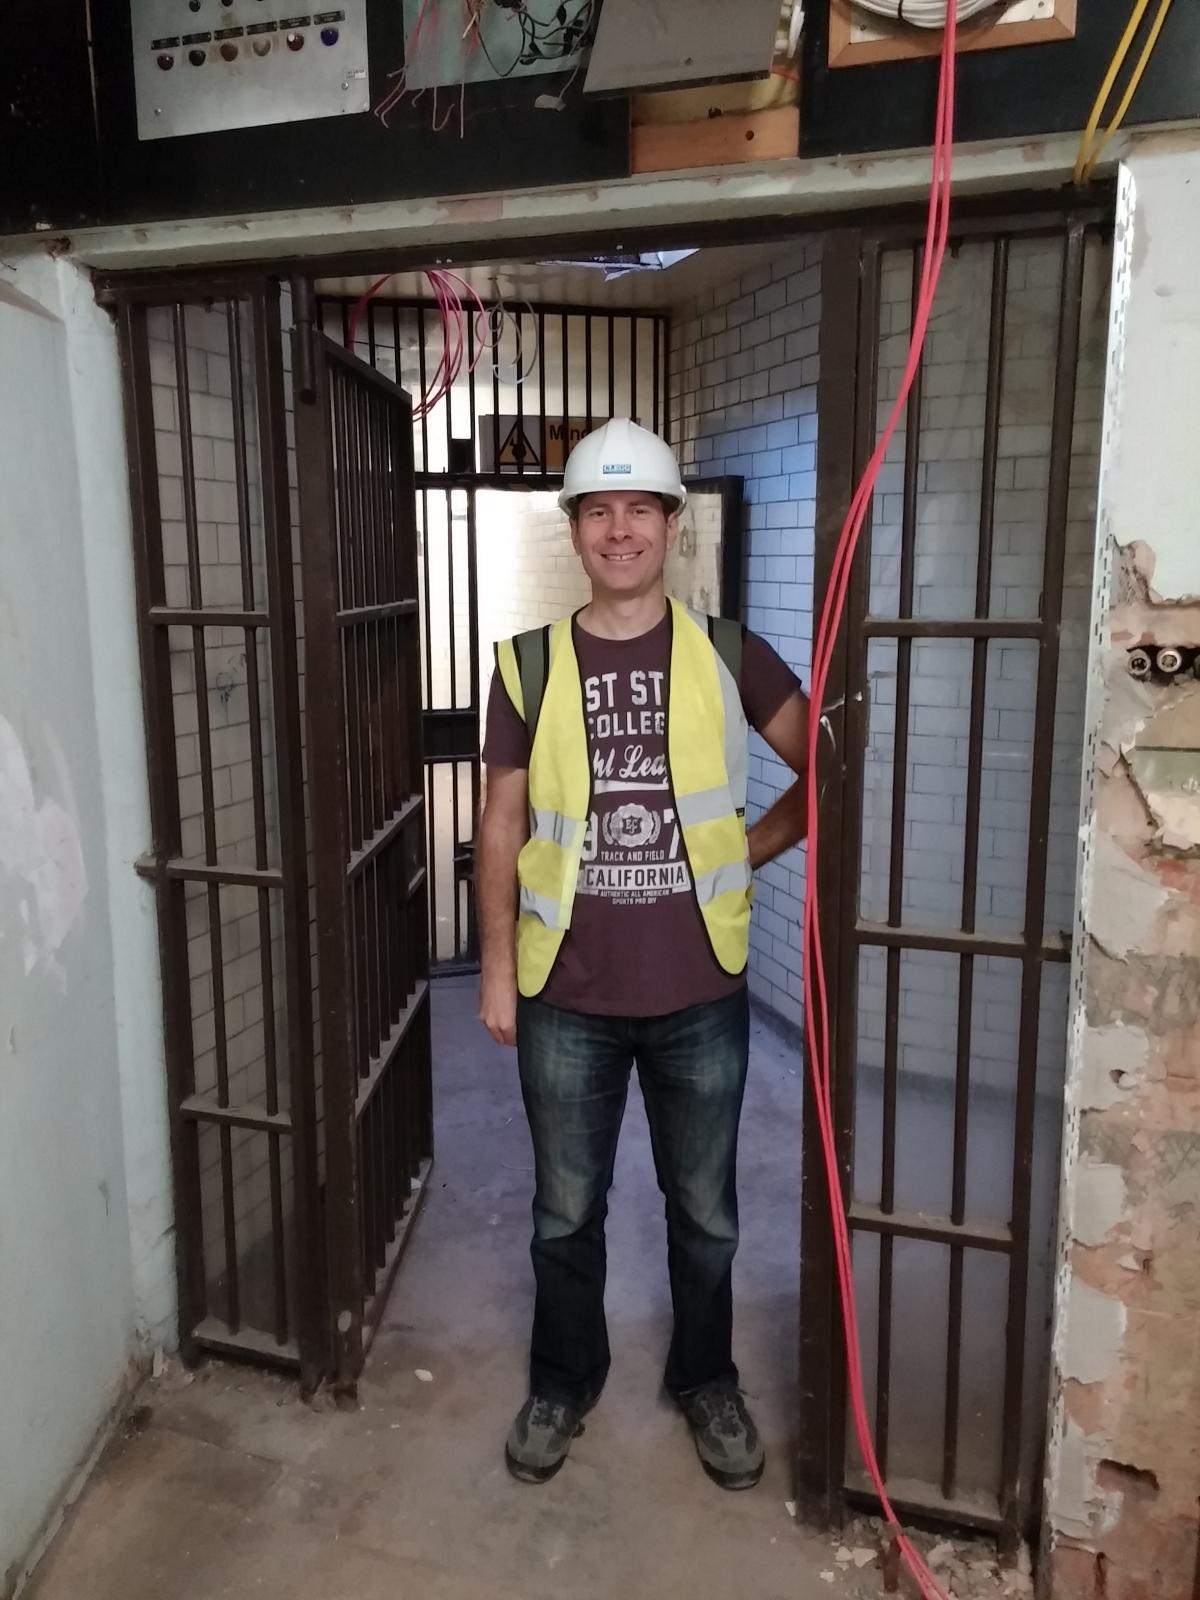 Jailhouse Cellfie